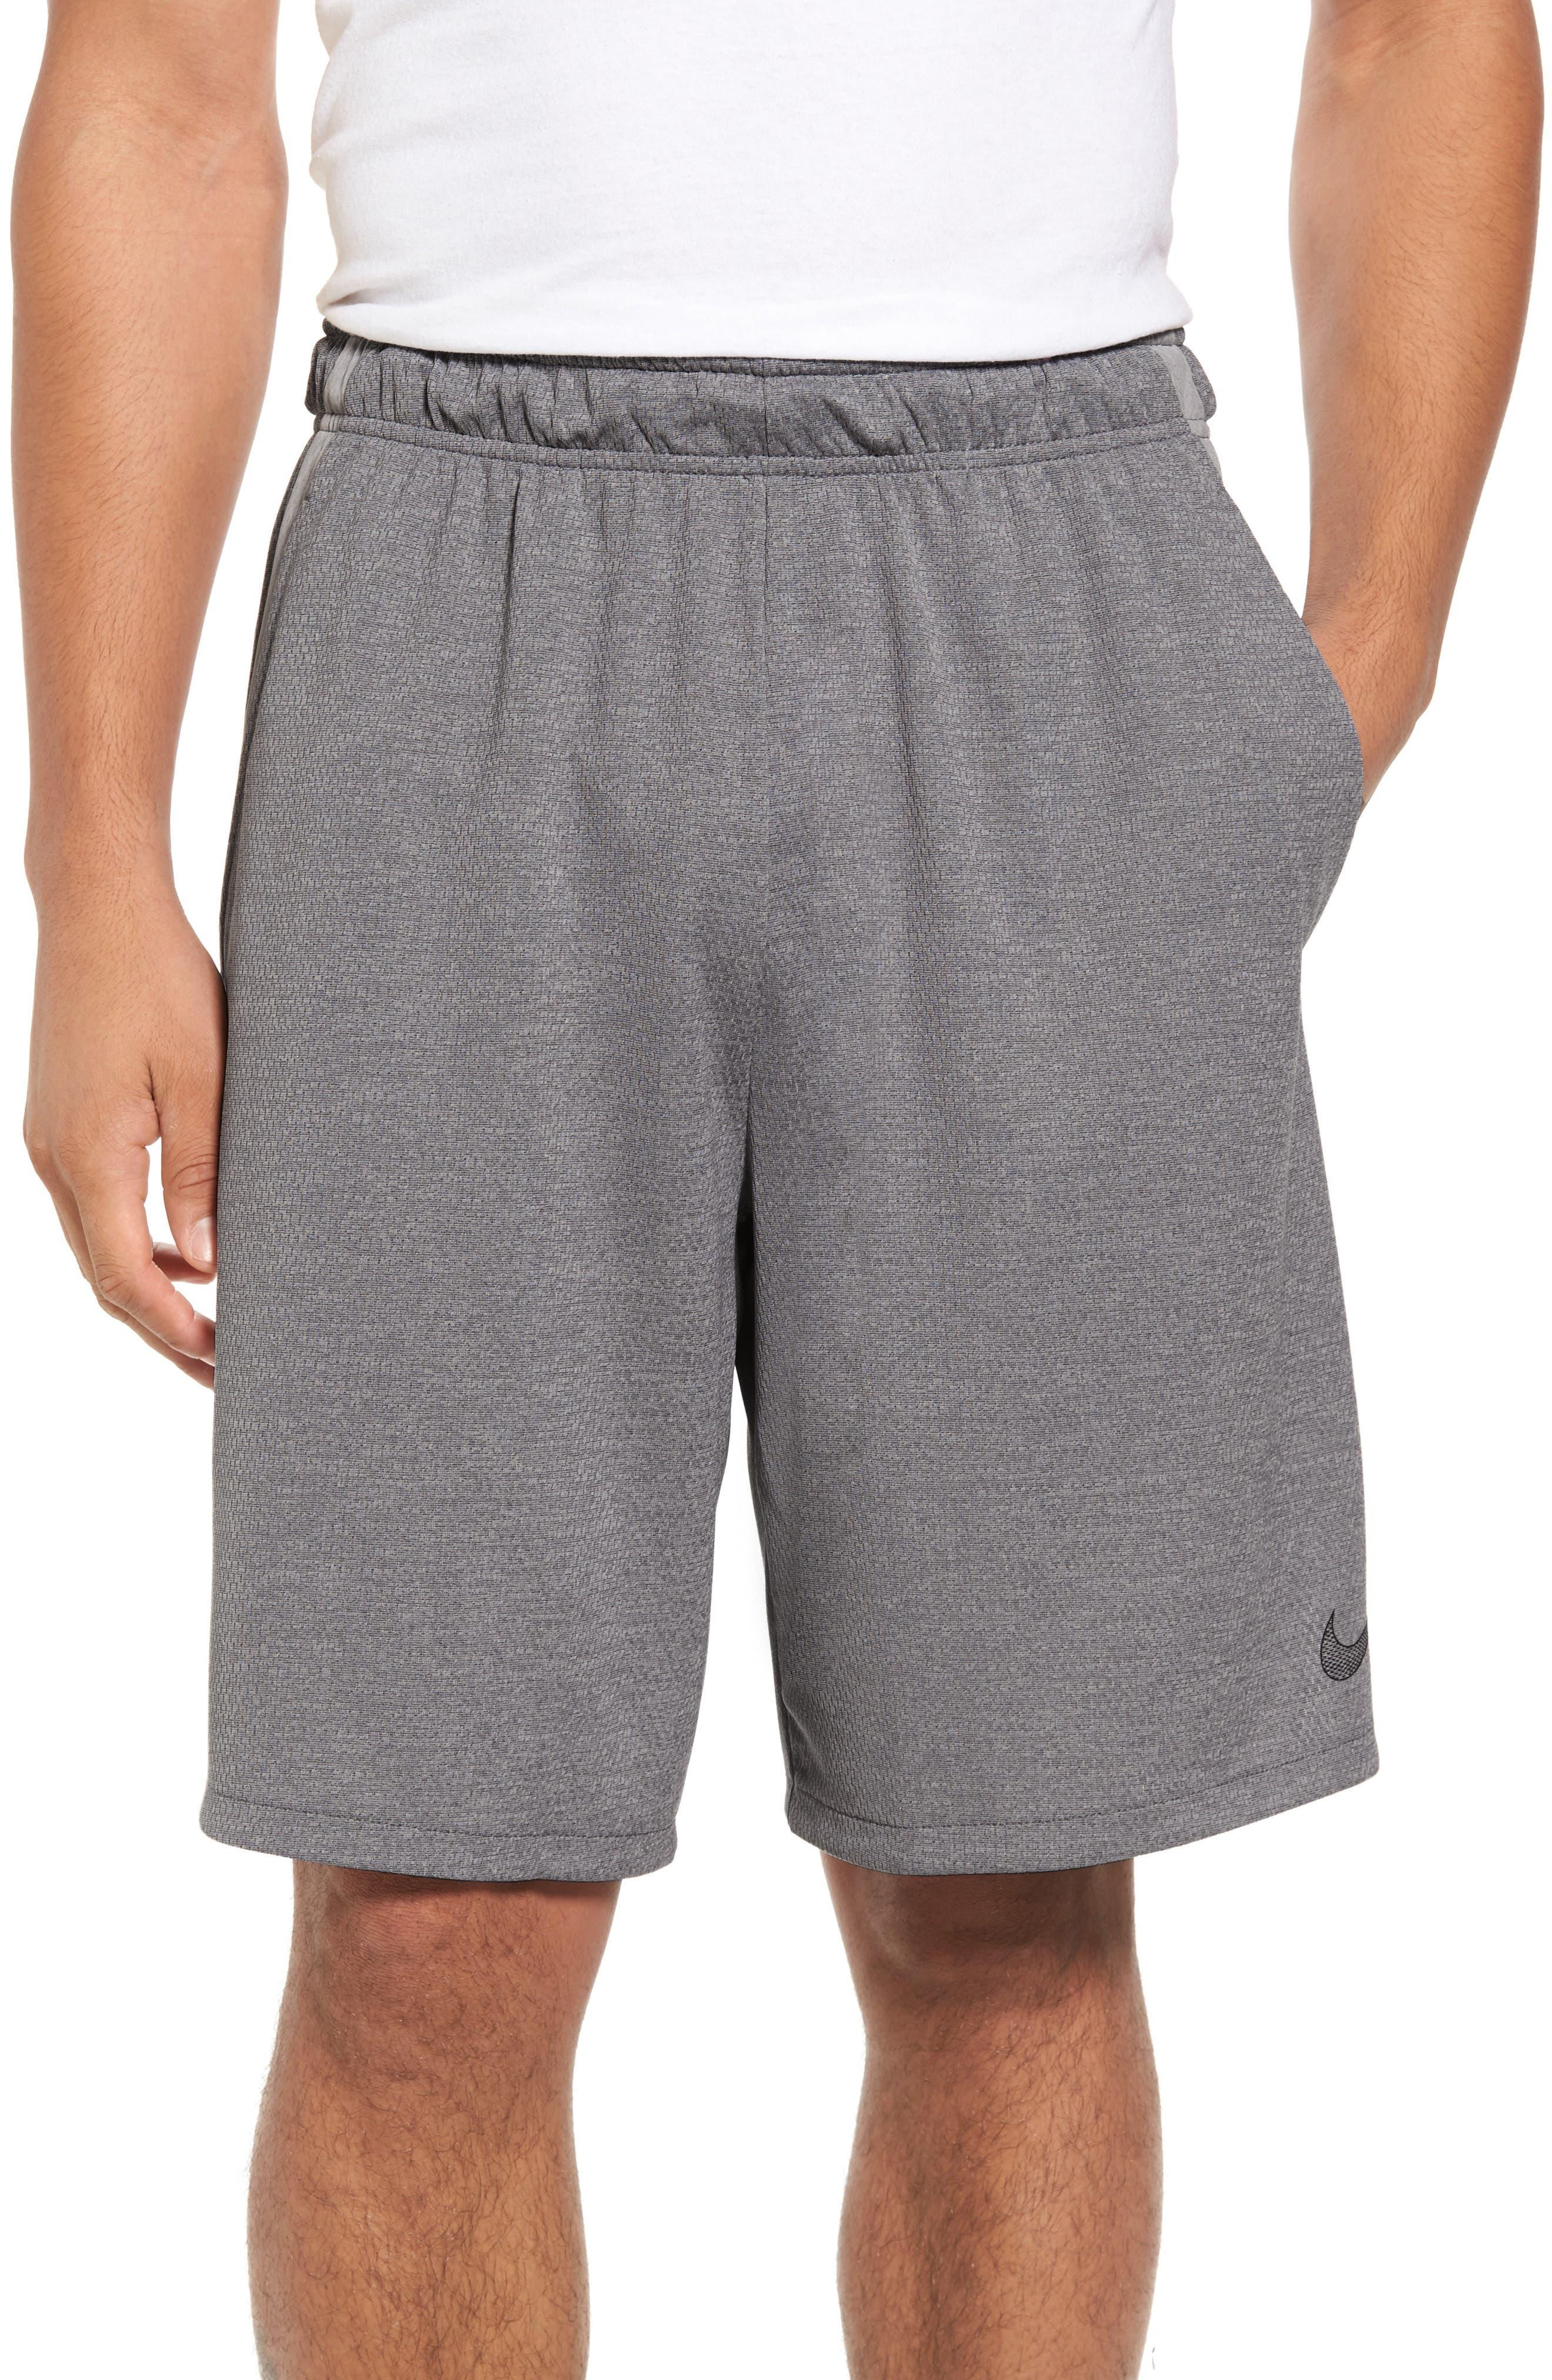 Training Dry 4.0 Shorts,                             Main thumbnail 2, color,